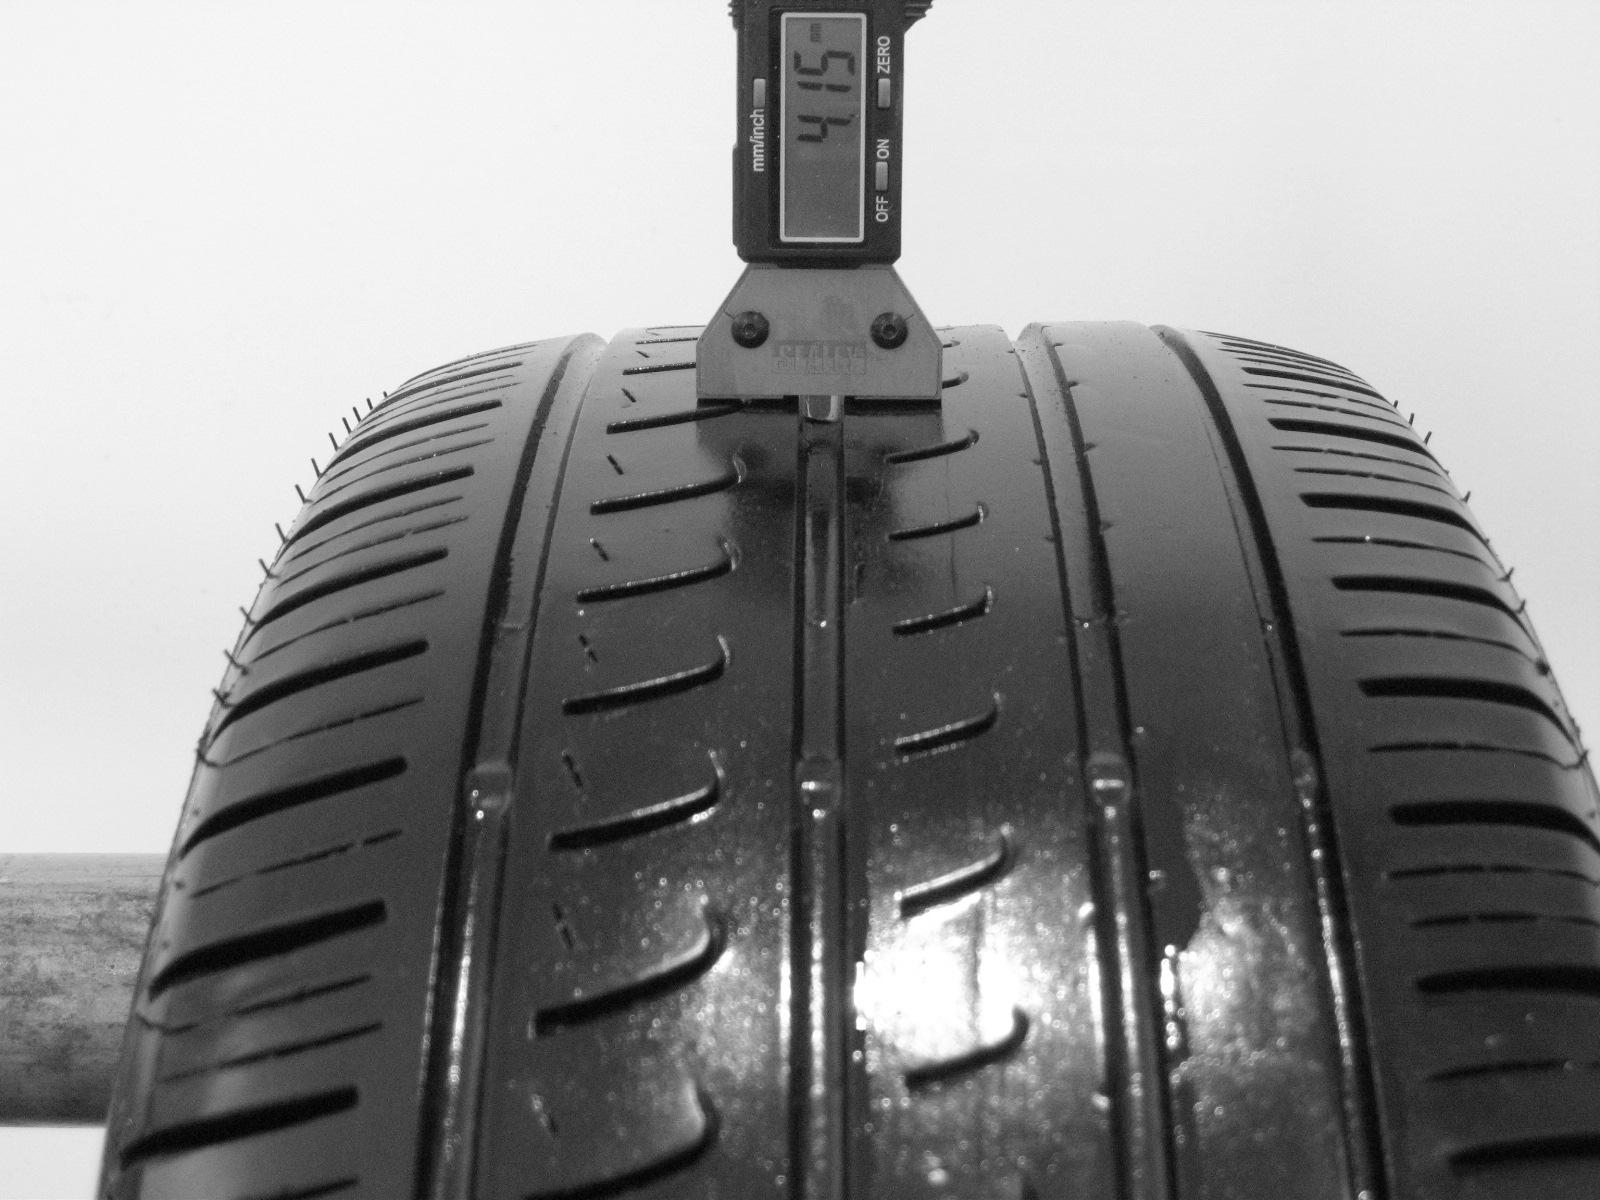 Použité-Pneu-Bazar - 225/50 R16 PIRELLI P7-kusovka-rezerva 3mm